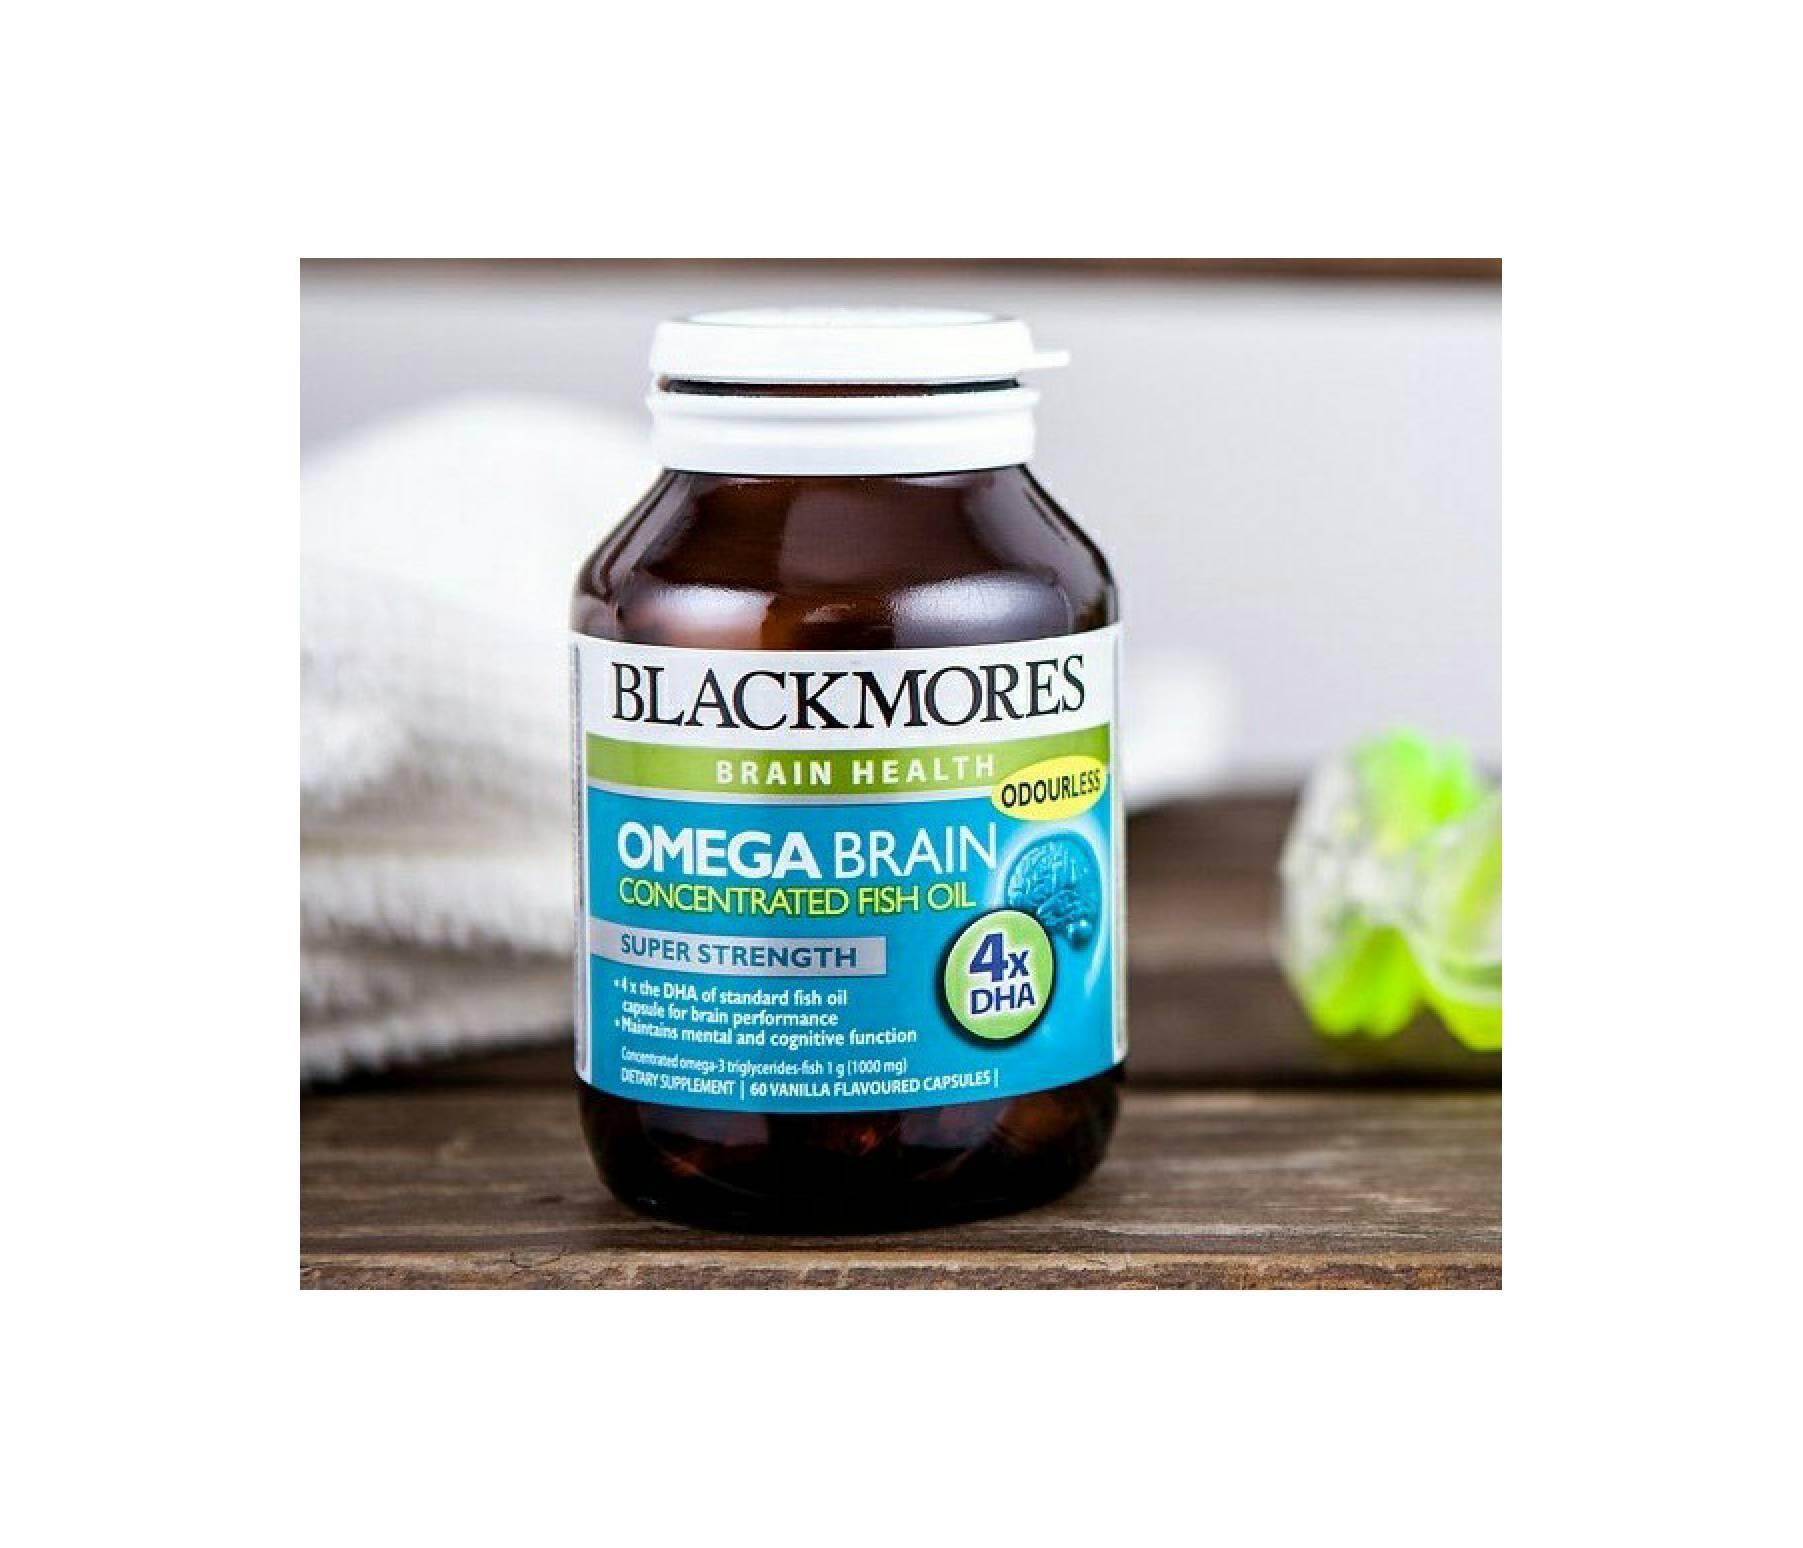 List Harga Blackmores Omega Brain Terpercaya Superkids Chewables Minyak Ikan Fish Oil Concentrated 60 Kapsul